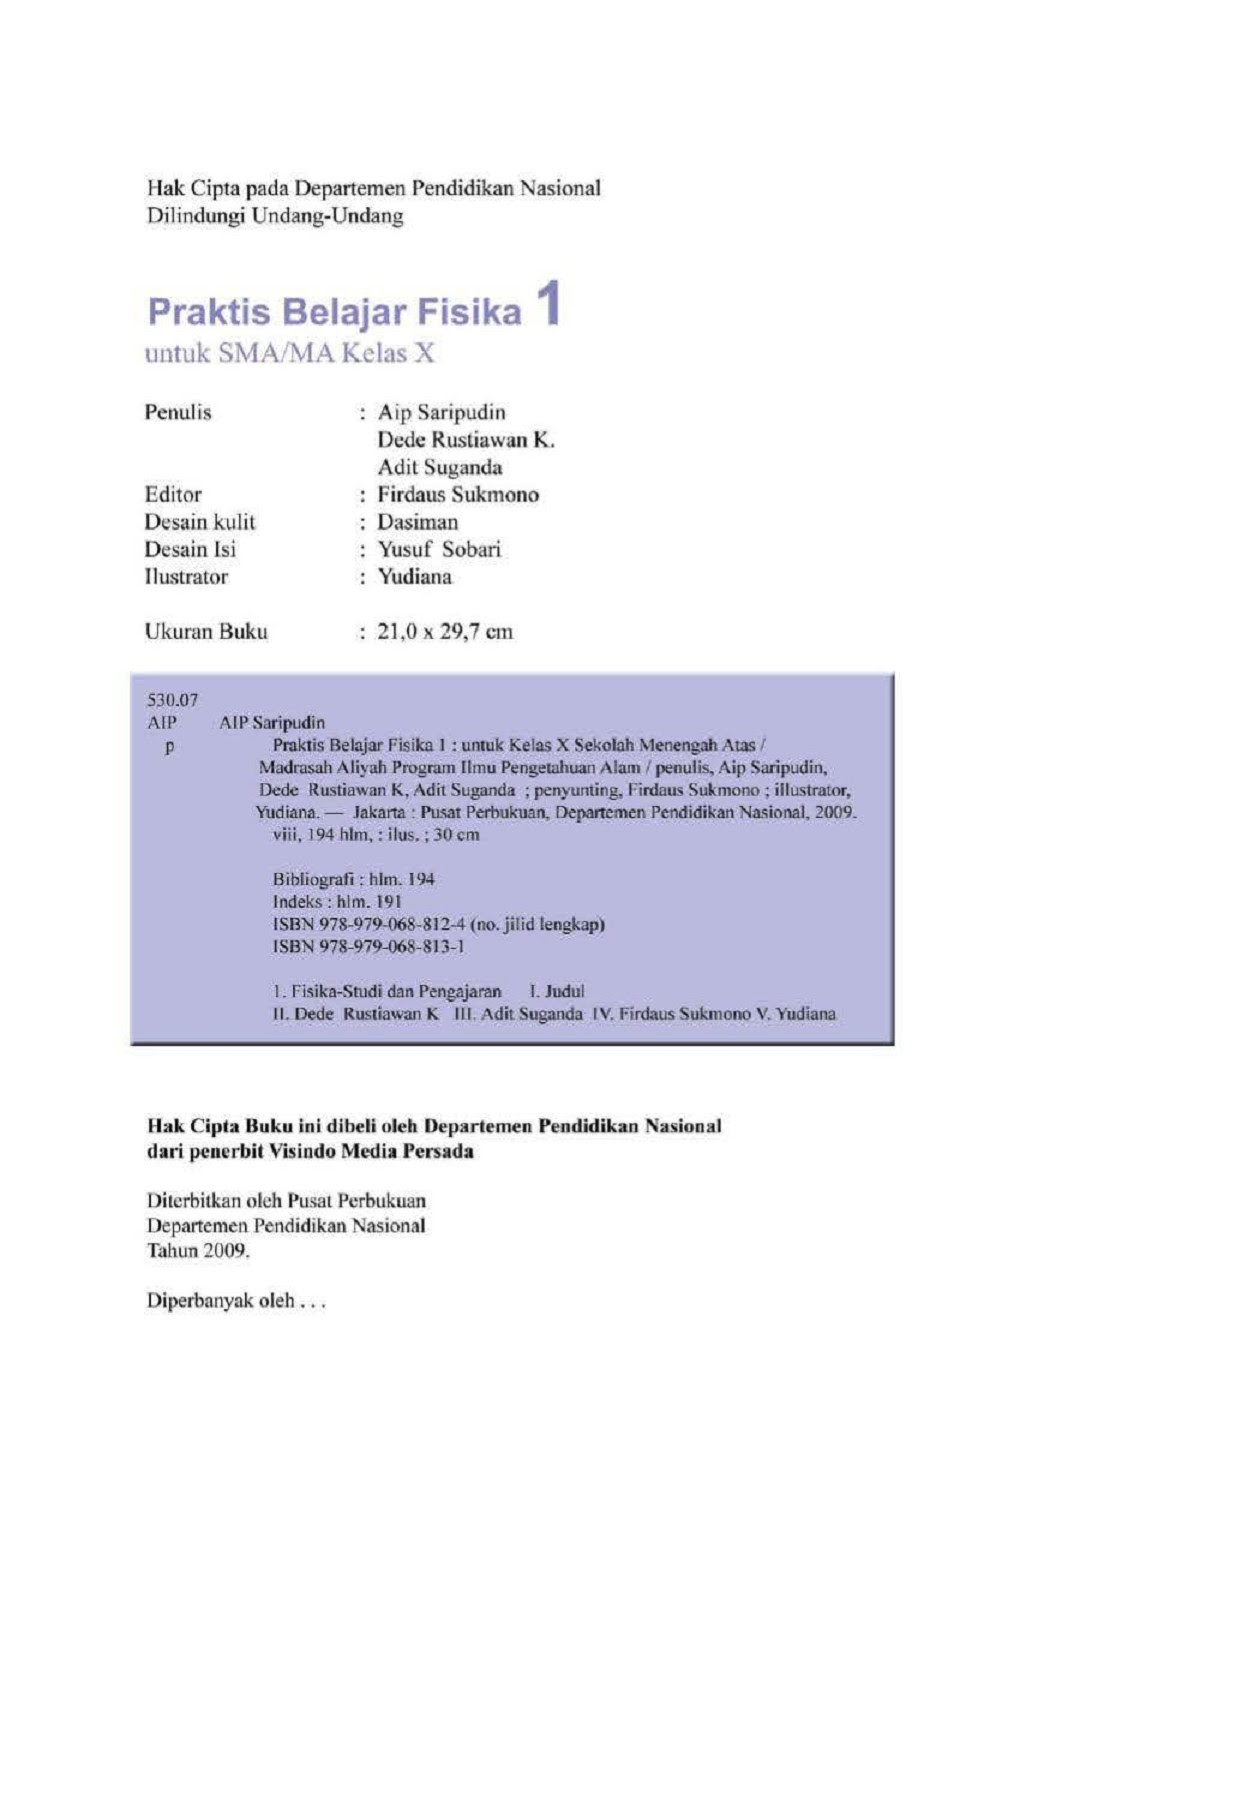 Praktis Belajar Fisika SMA X Jilid 1 Aip Saripudin dkk Pages 1 50 Text Version